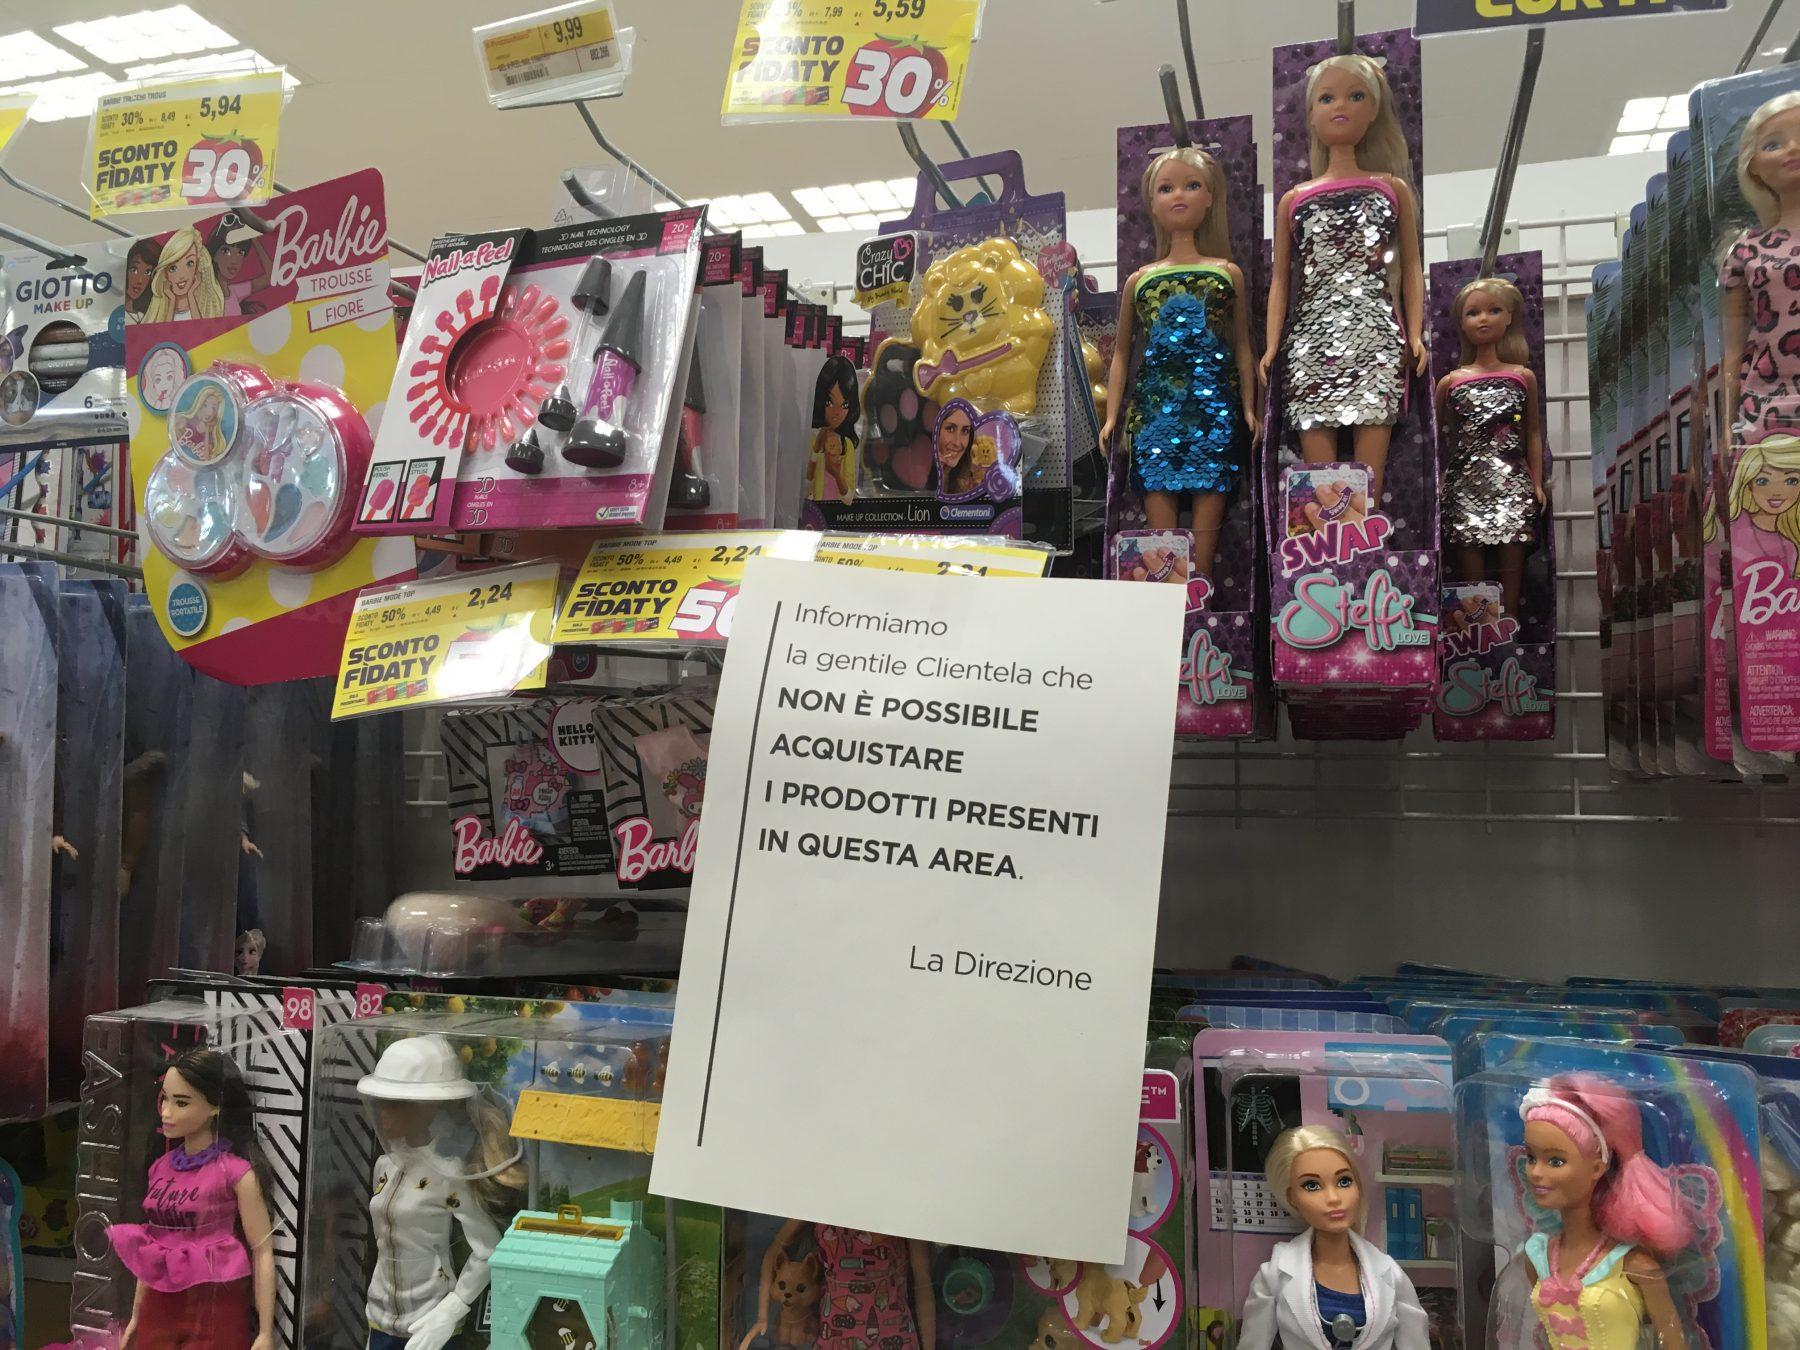 Supermercati Esselunga